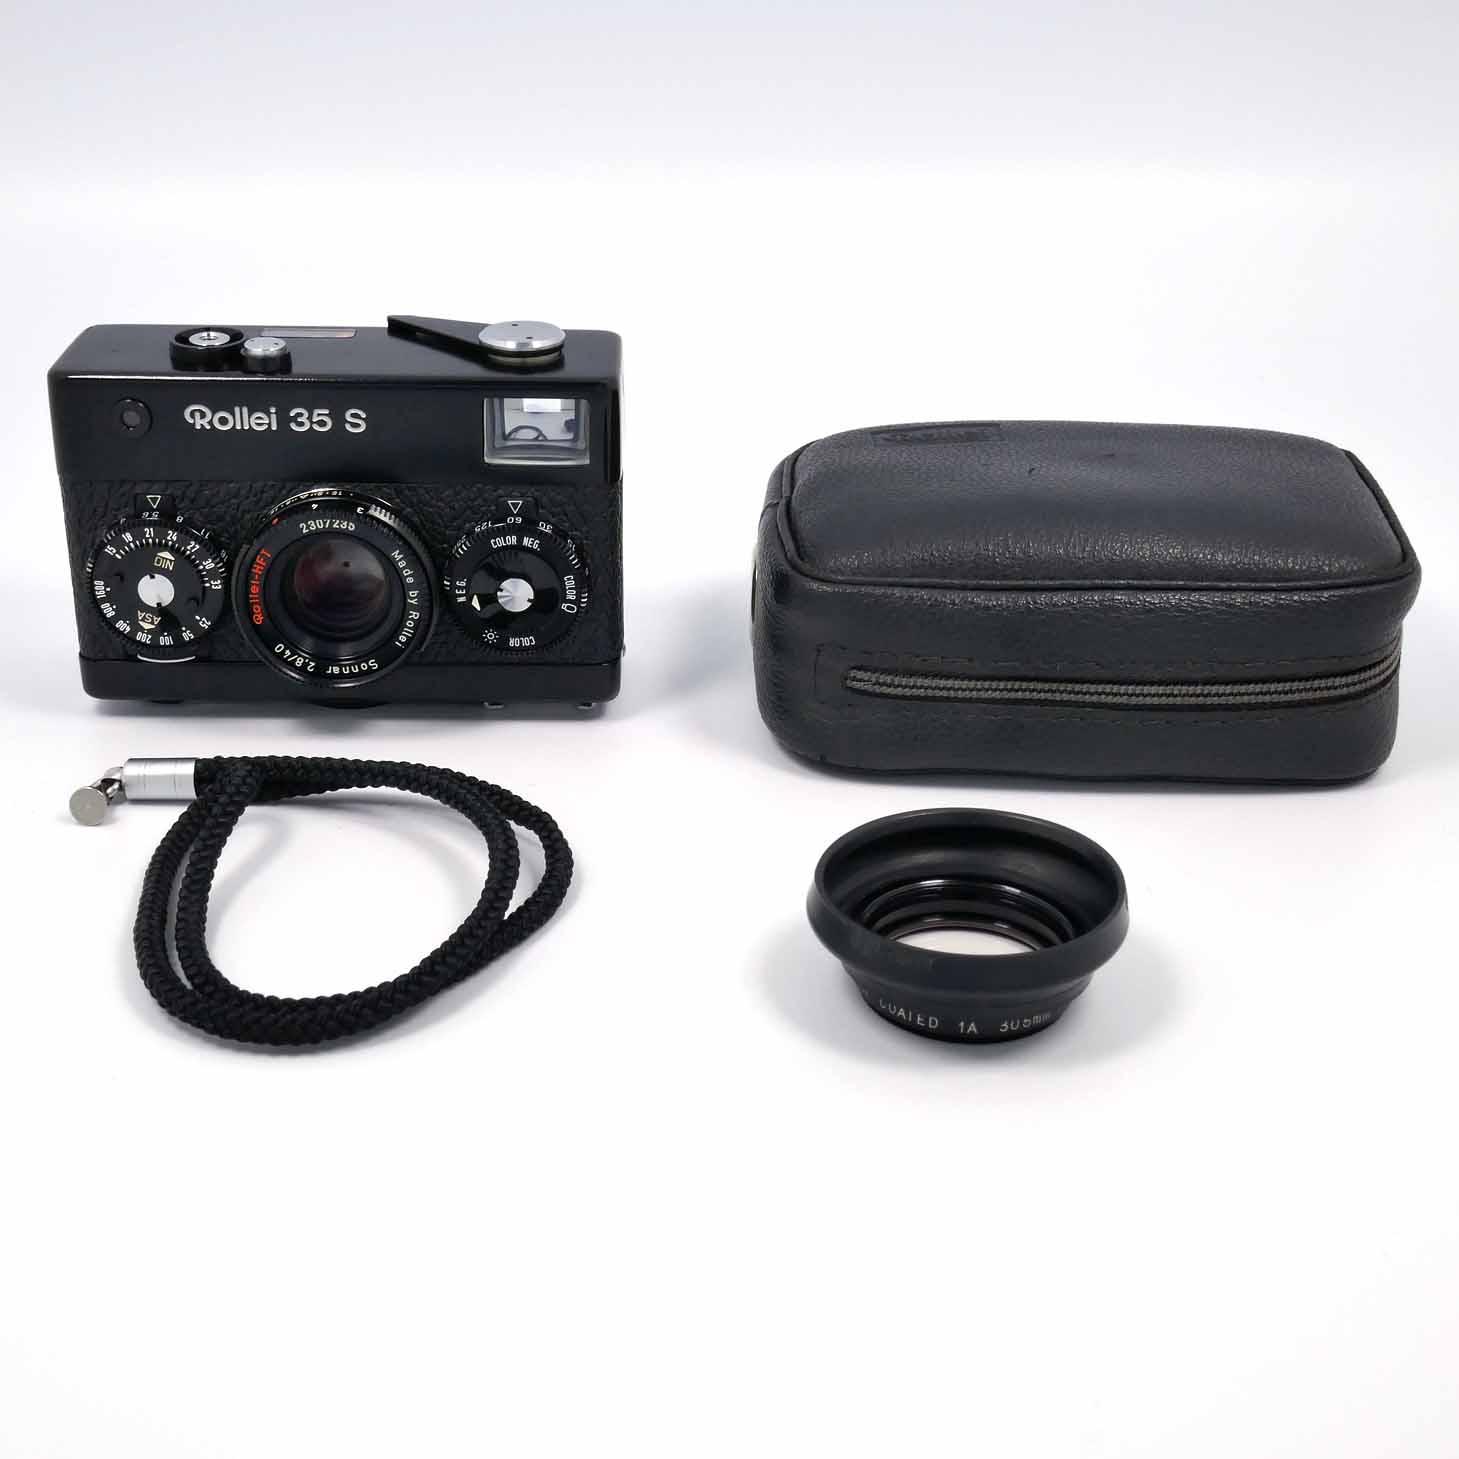 clean-cameras-Rollei-35-S-14